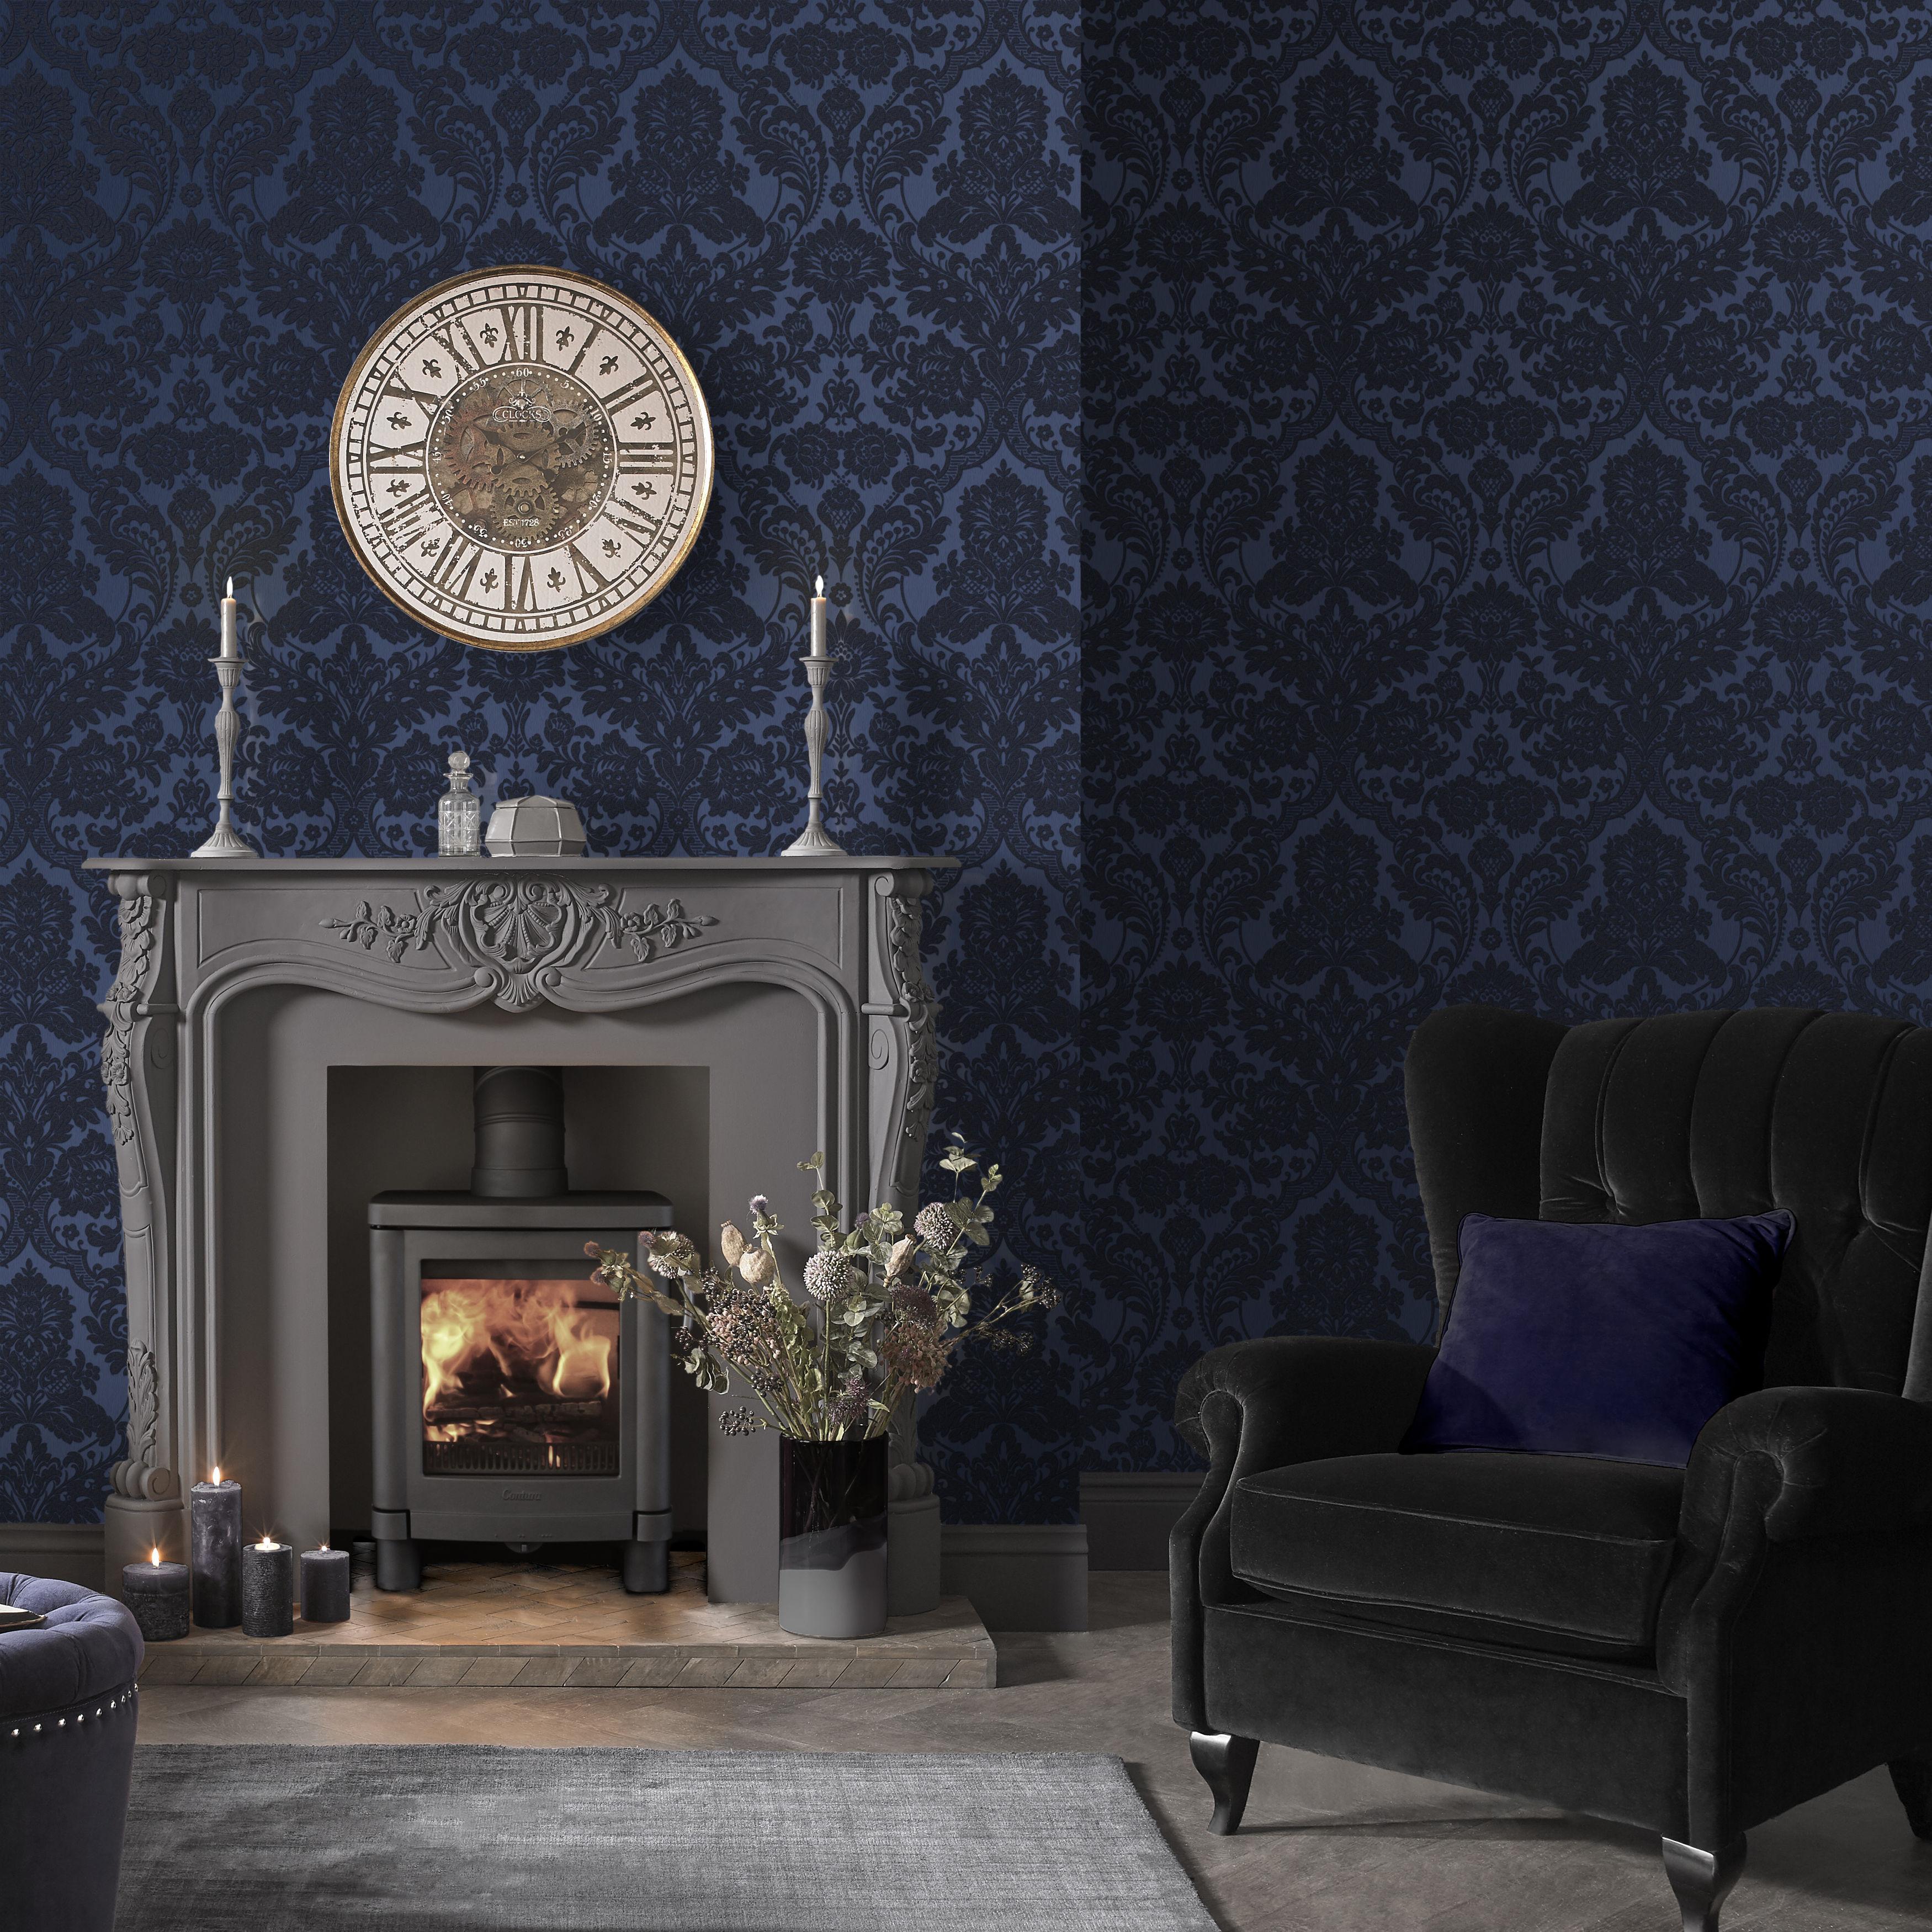 Gothic Damask Flock Cobalt Wallpaper, £75 per roll, in a rich cobalt, Graham & Brown